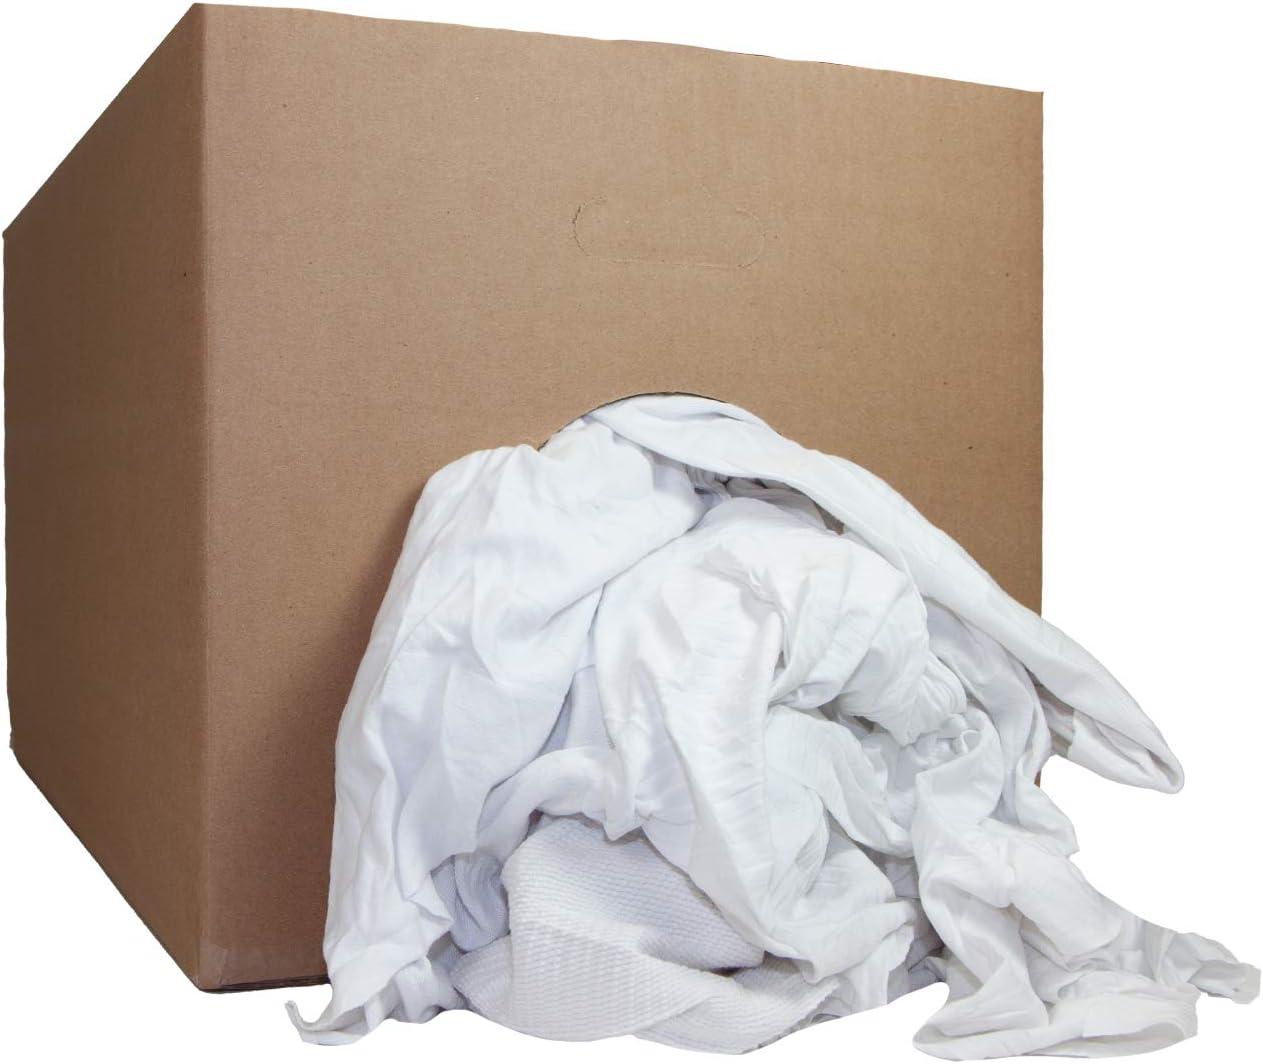 Arkwright LLC White Knit Cleaning T-Shirt 信託 25 Box lbs. Rags - B 優先配送